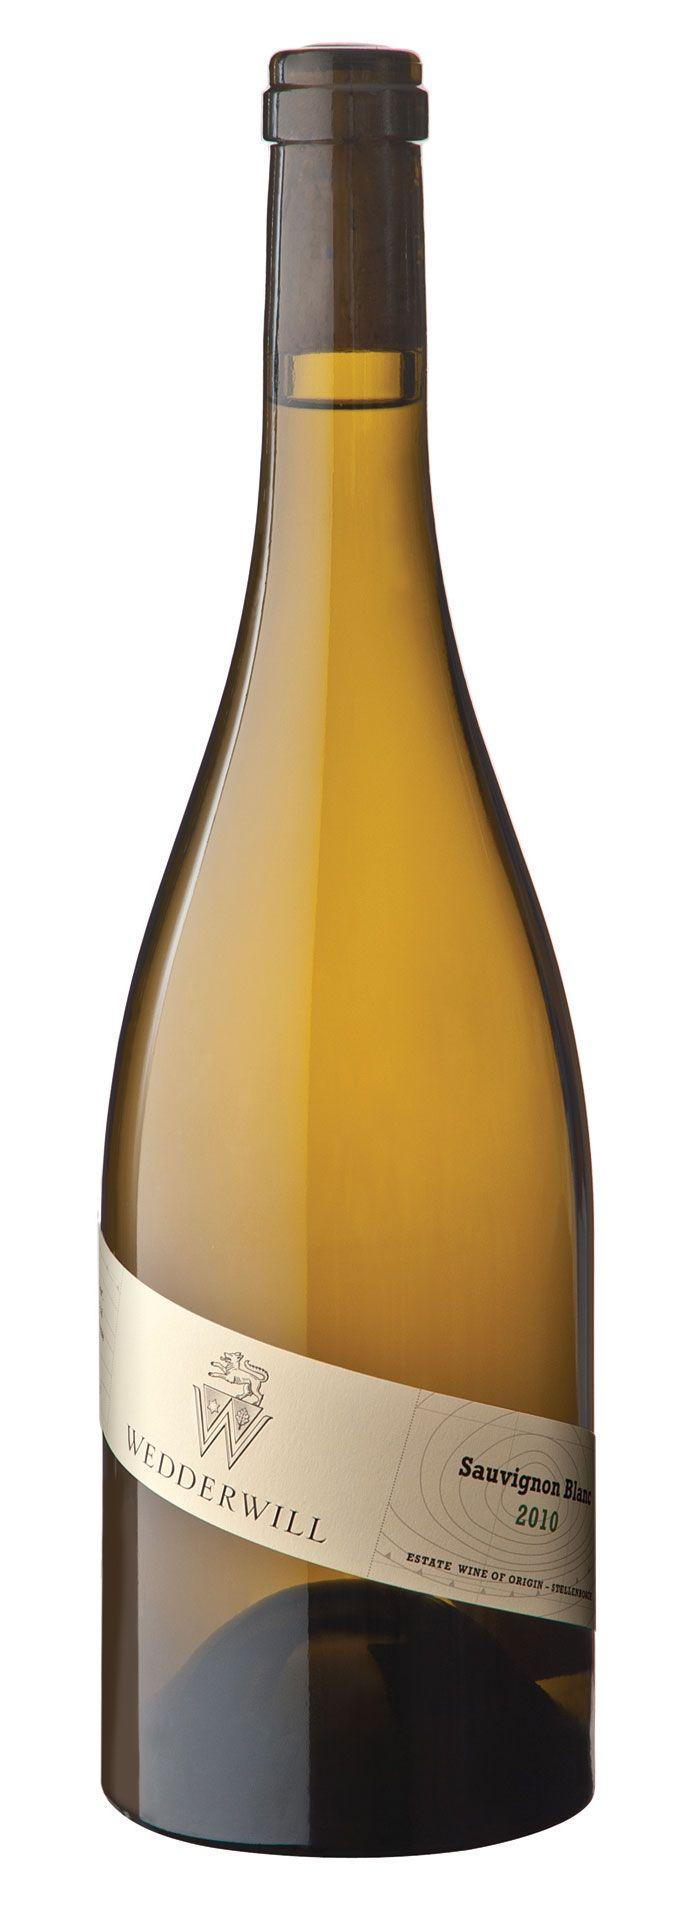 Wine label design for Wedderwill in South Africa - From Thedieline.com    Etichetta per vino bianco creata per Wedderwill, Sudafrica - dal sito Thedieline.com